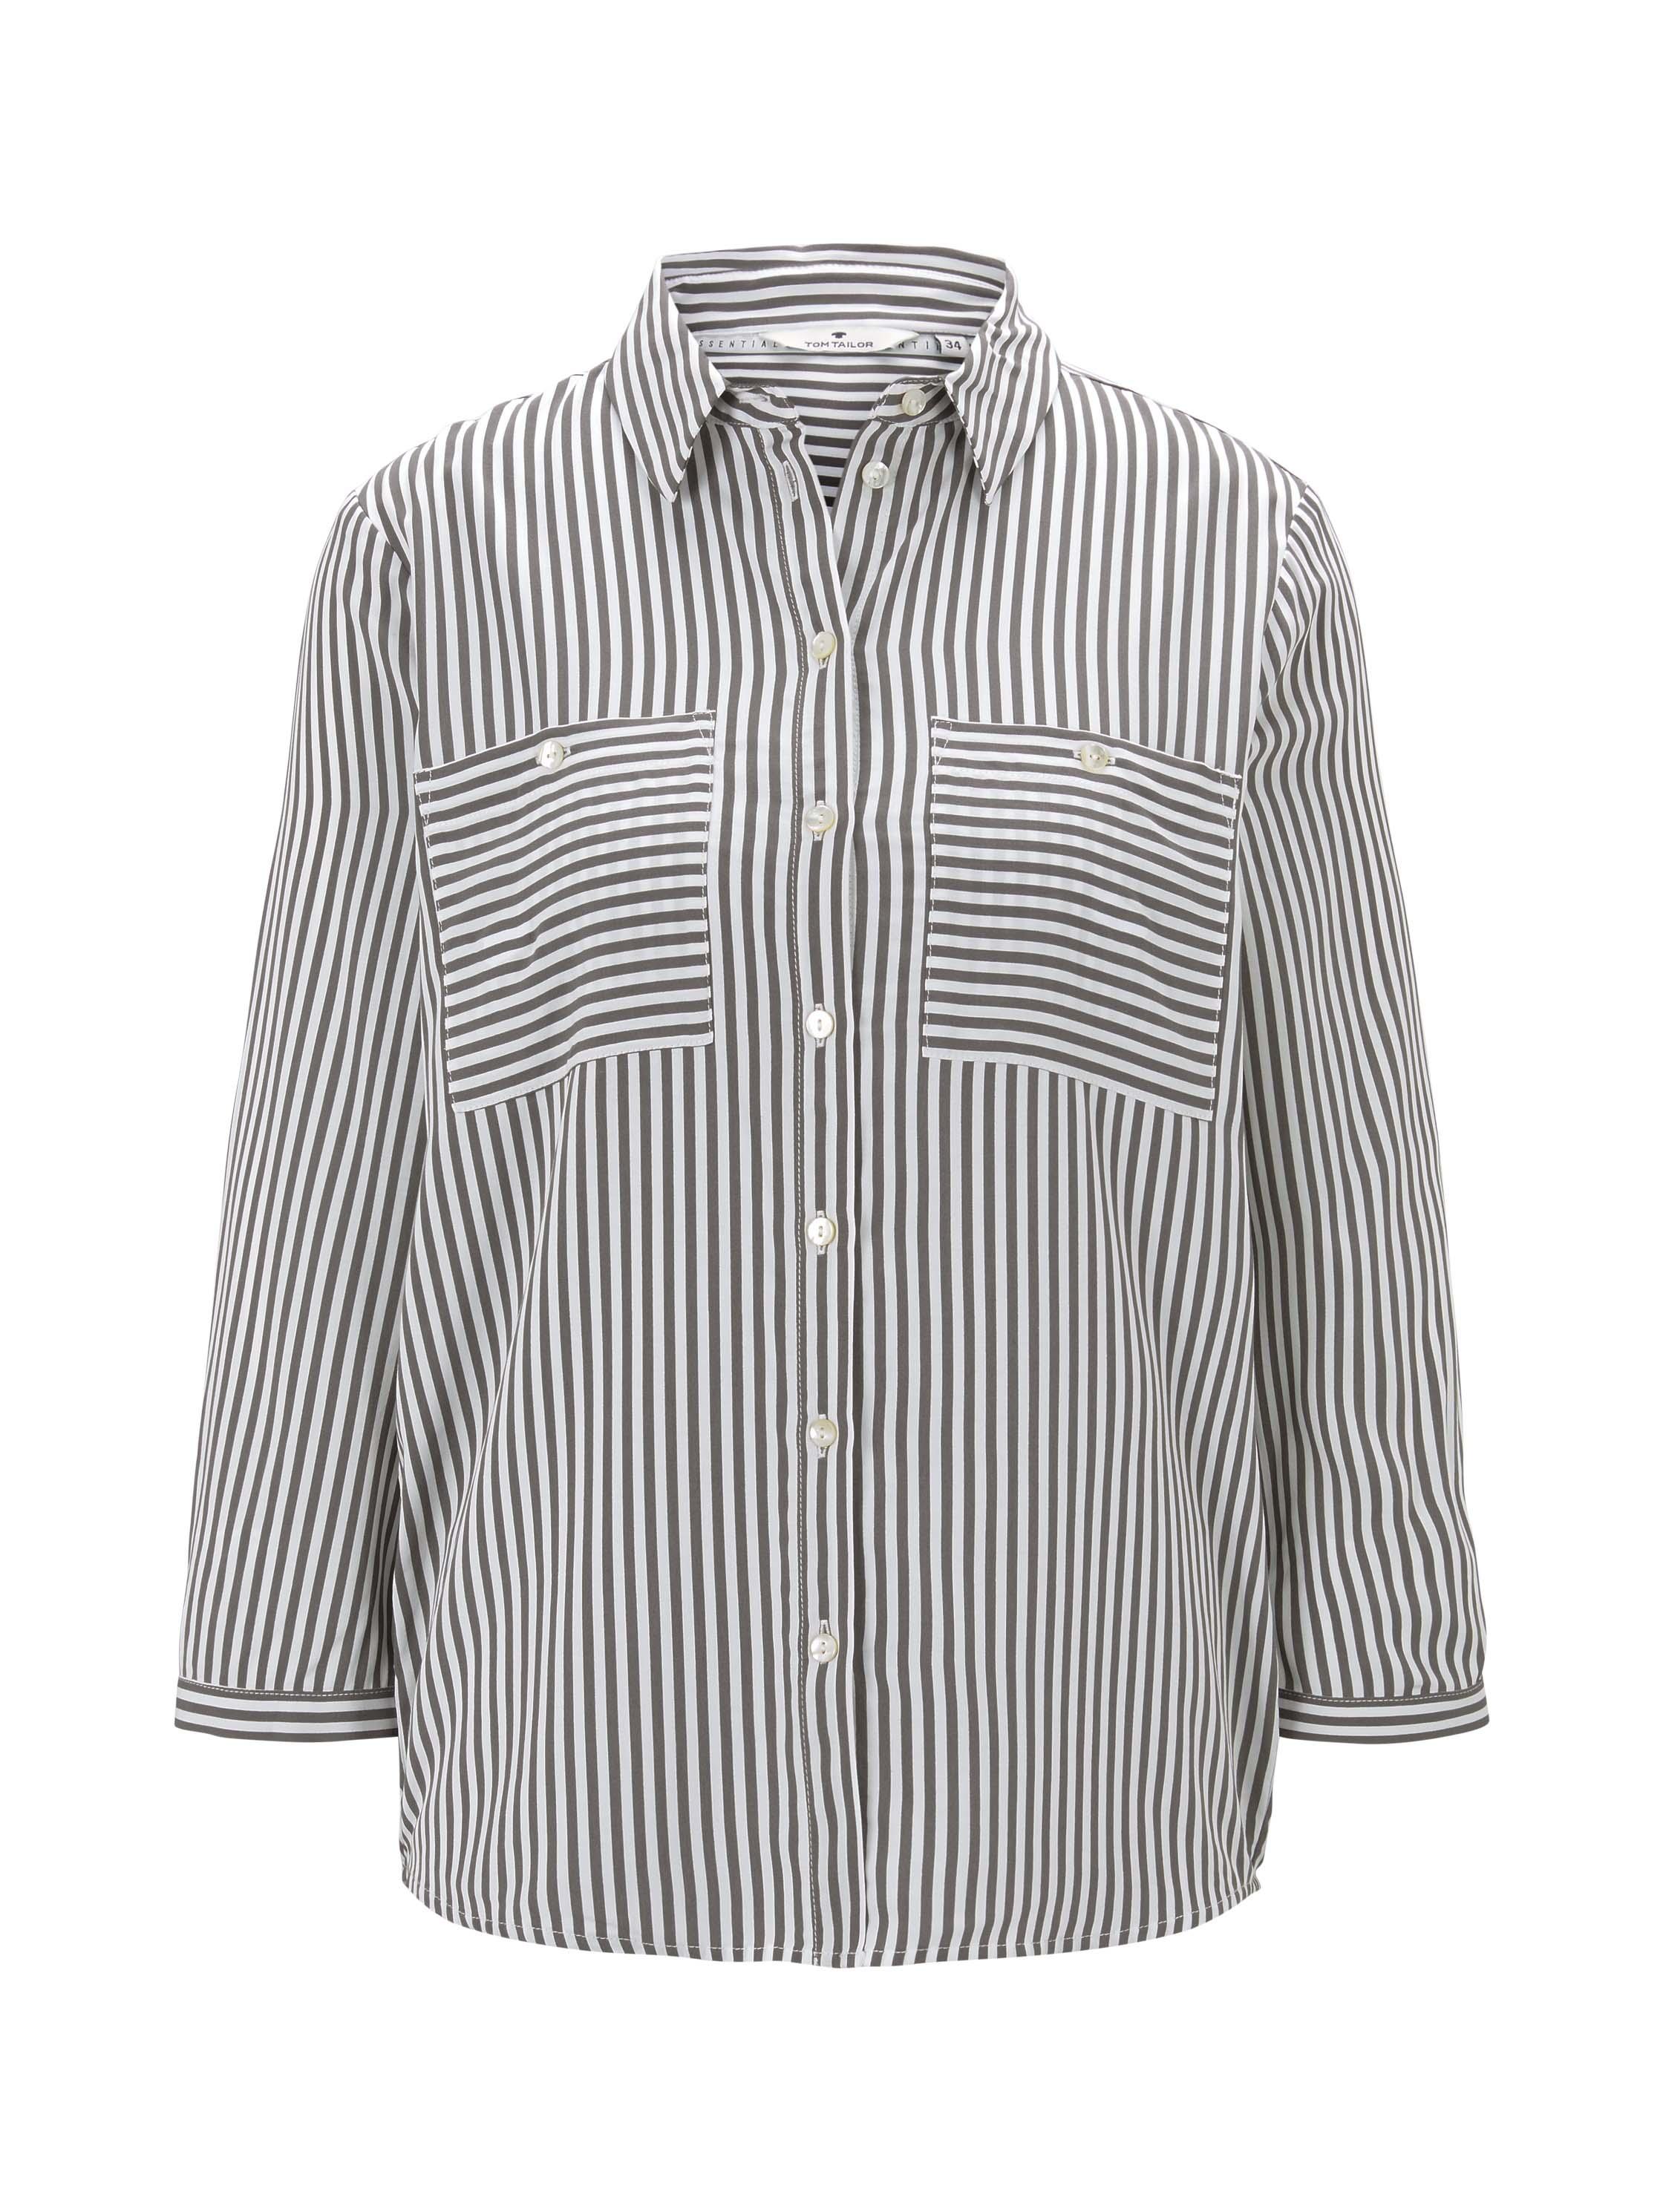 blouse printed stripe, grey vertical stripe